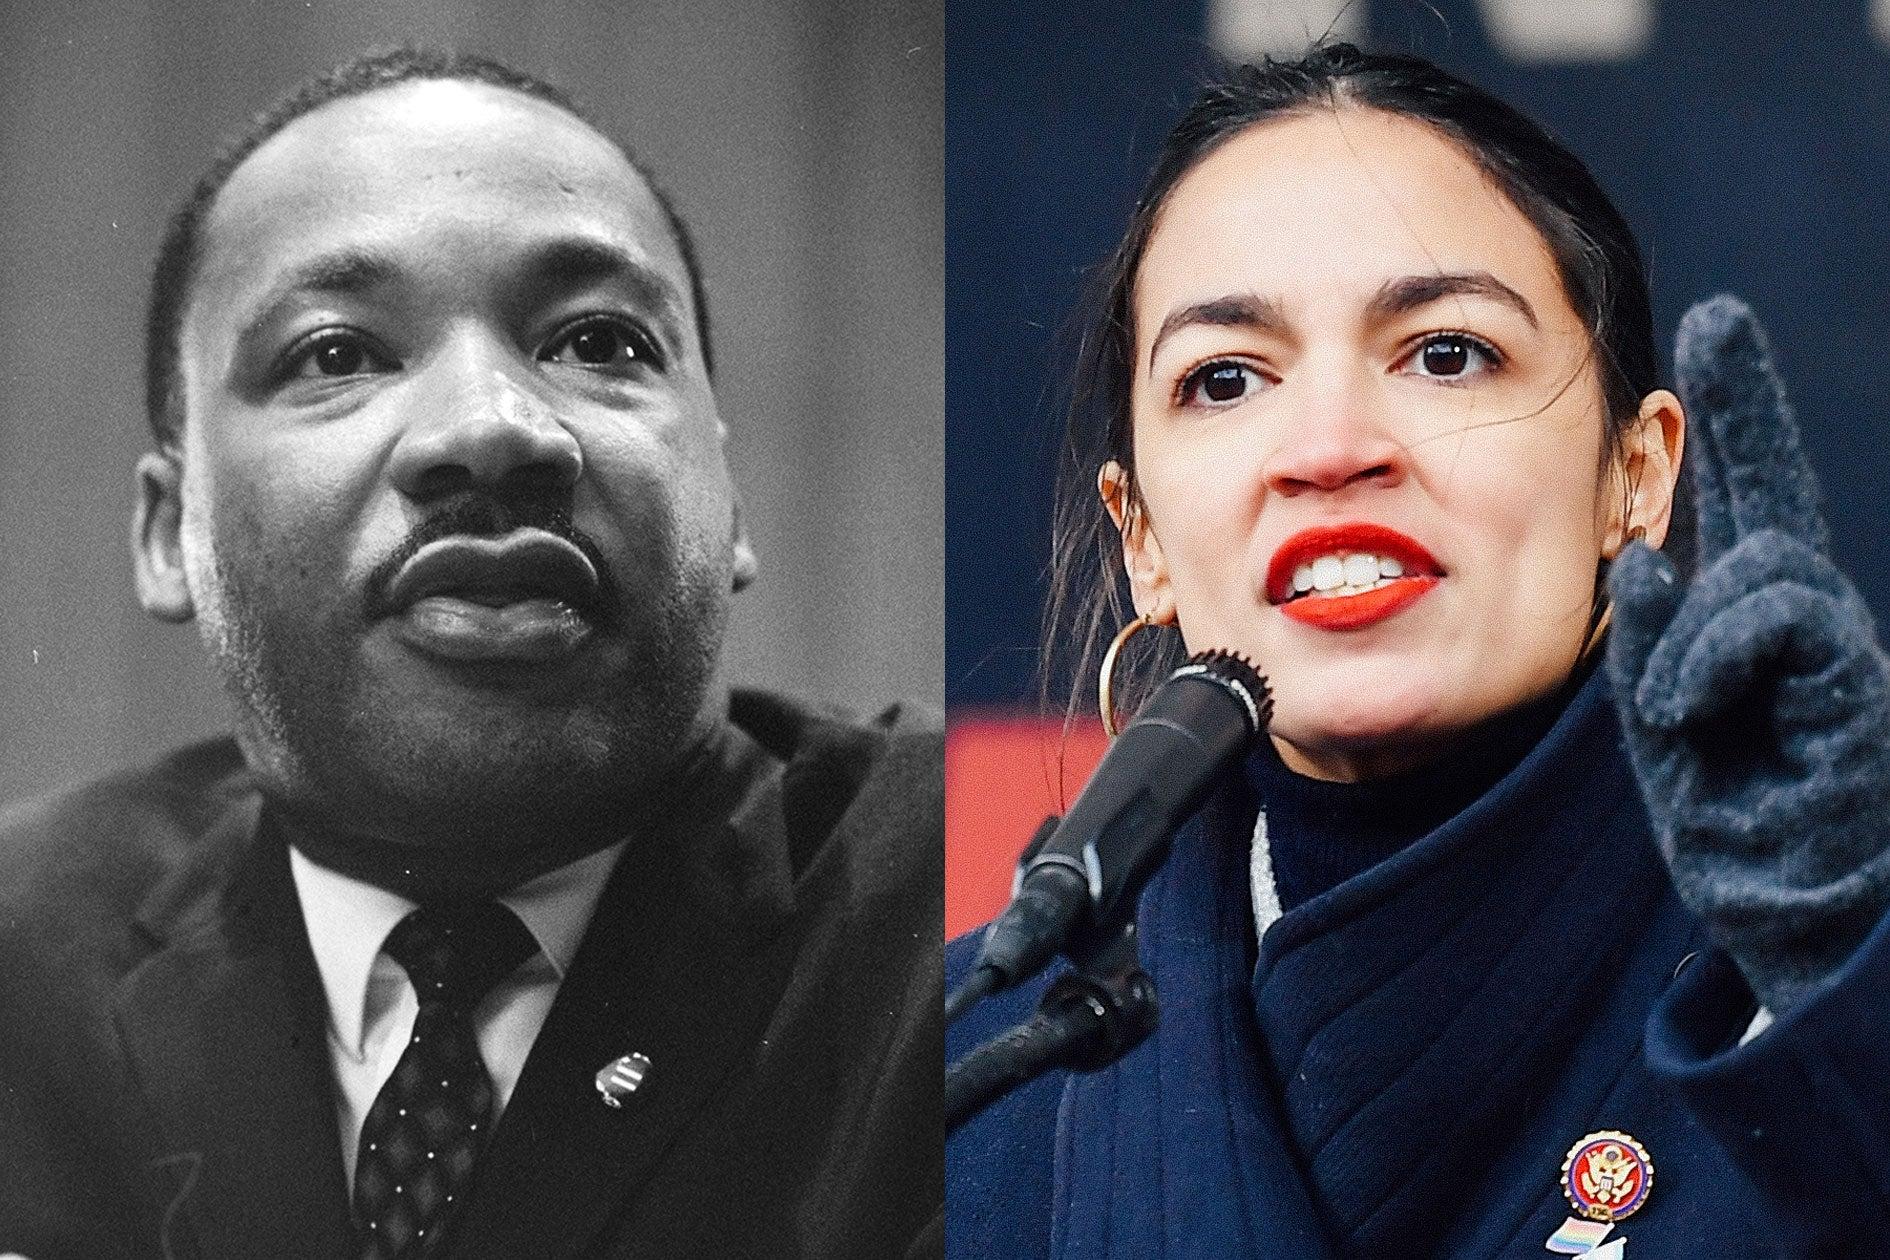 Martin Luther King Jr., Alexandria Ocasio-Cortez.